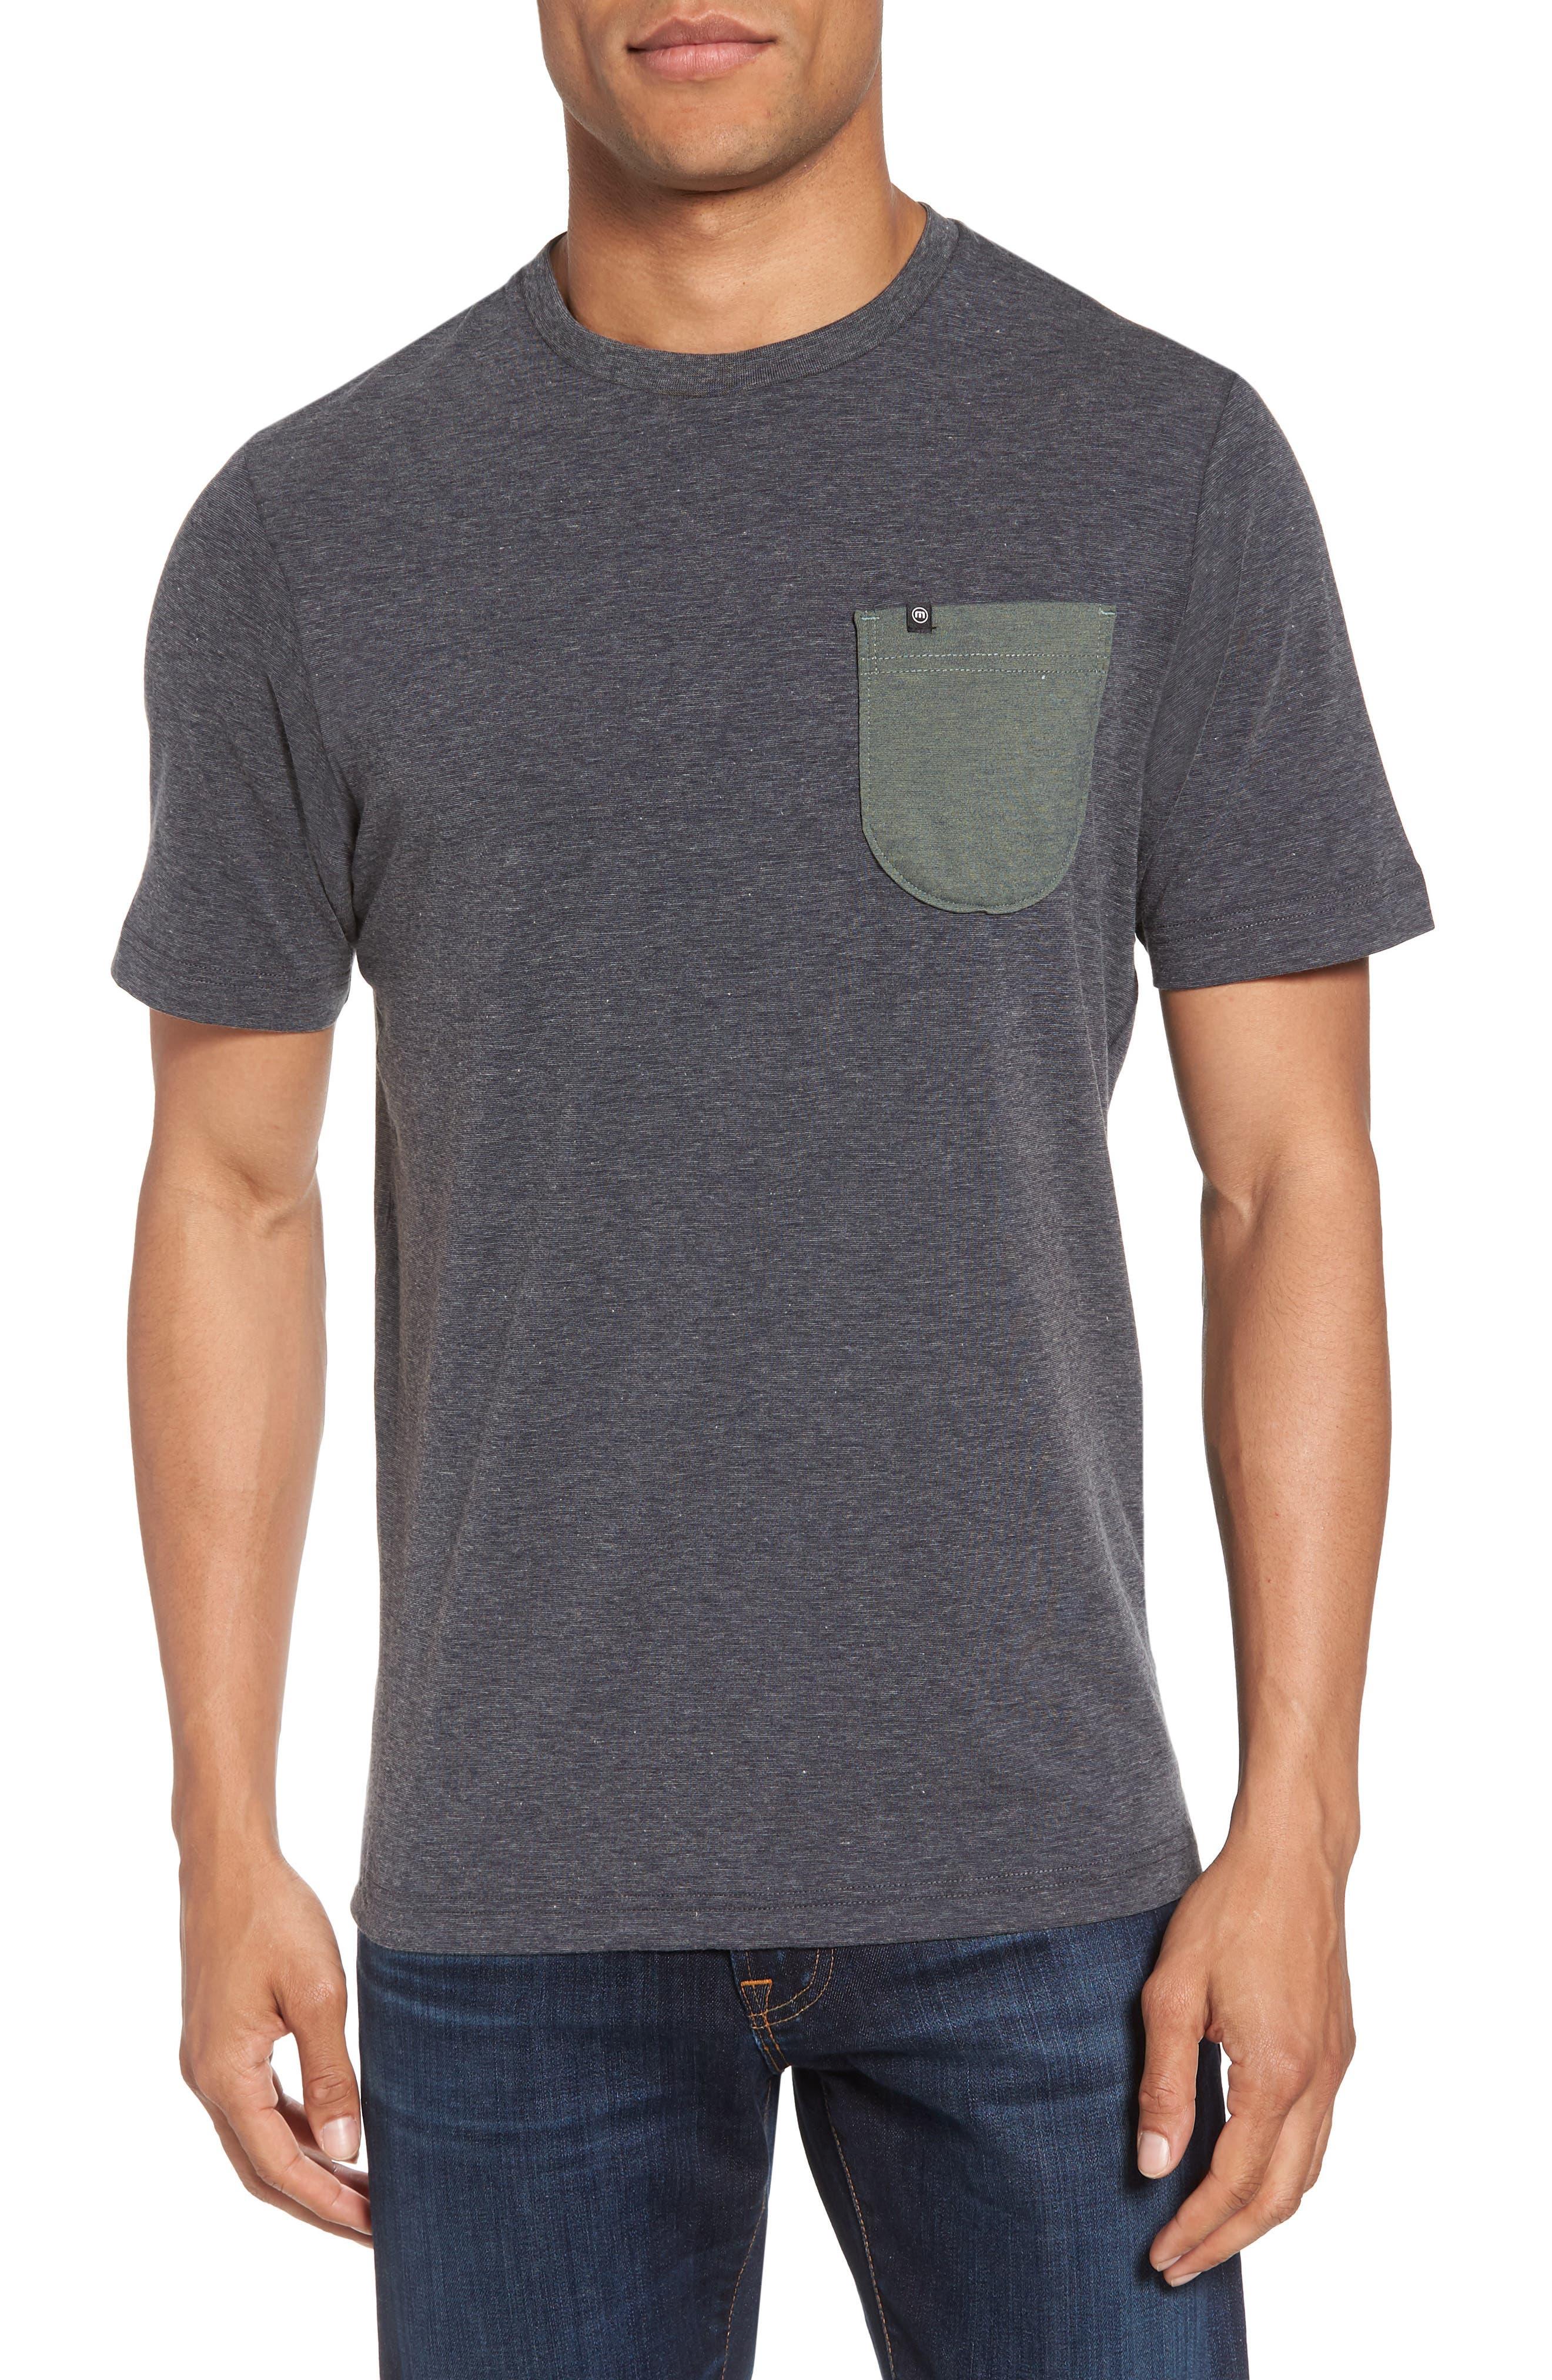 Travis Mathew The Circuit T-Shirt